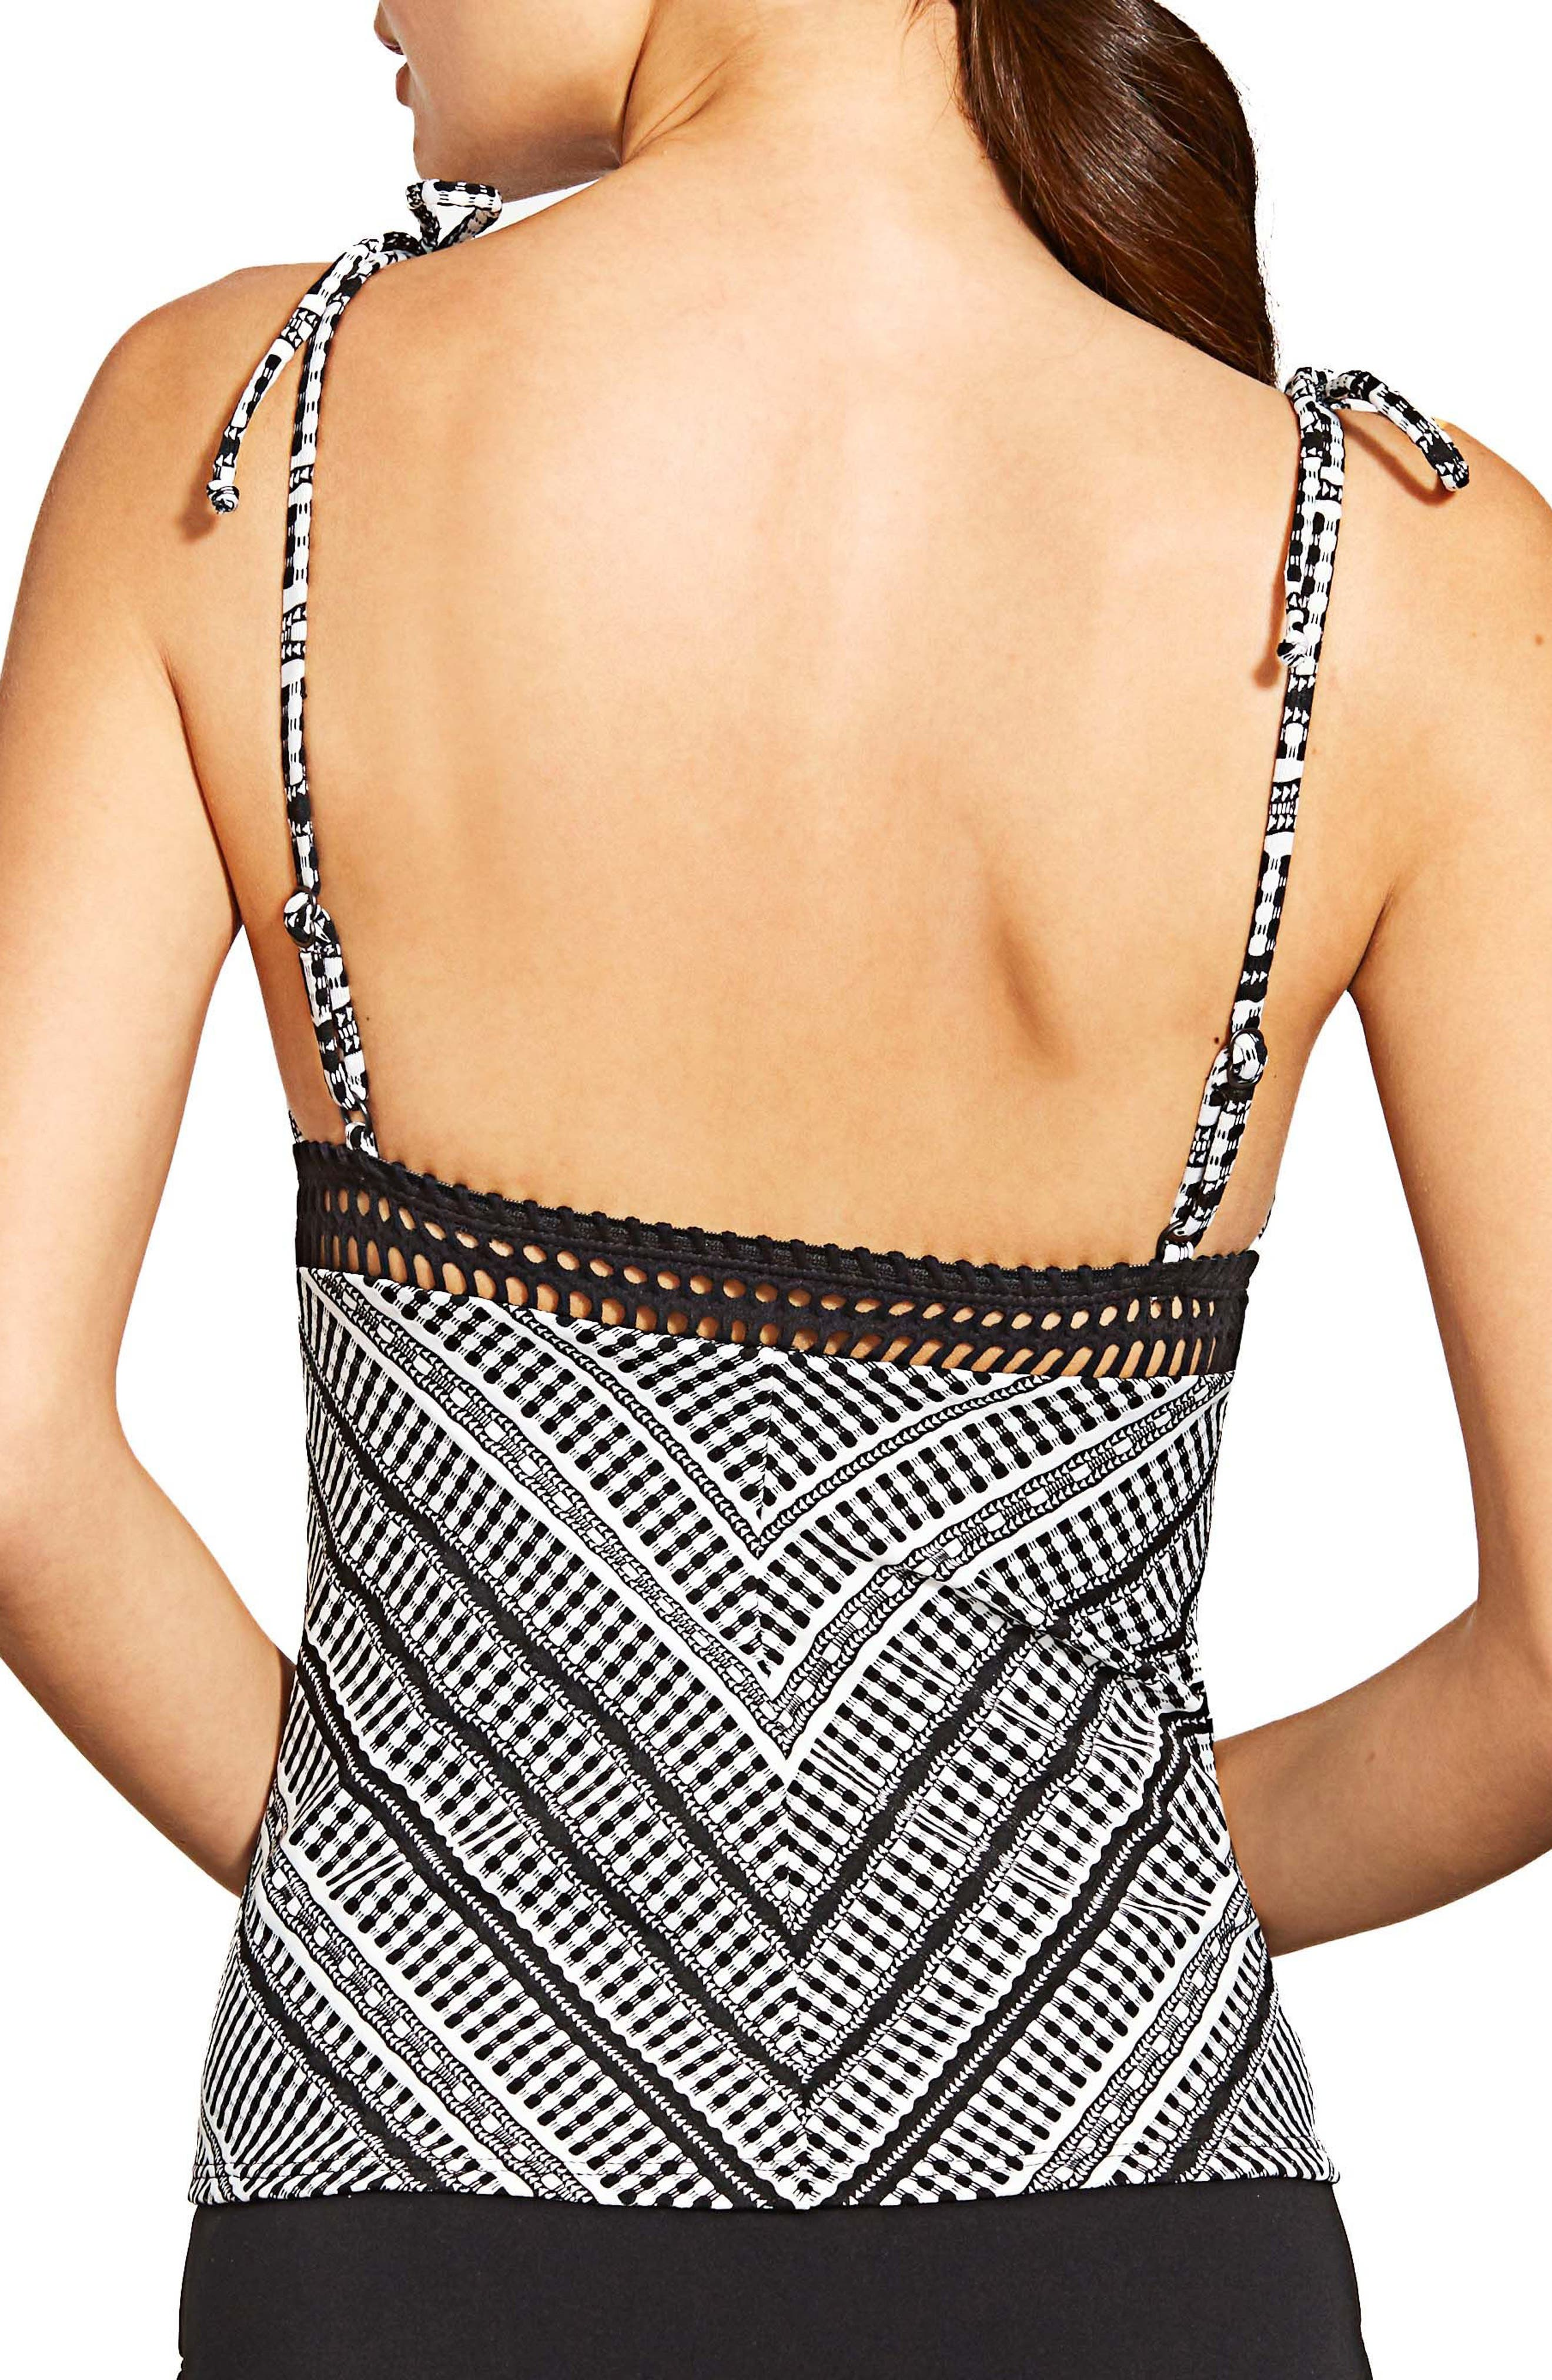 Avery Check Stripe Tankini Top,                             Alternate thumbnail 2, color,                             BLACK/ WHITE